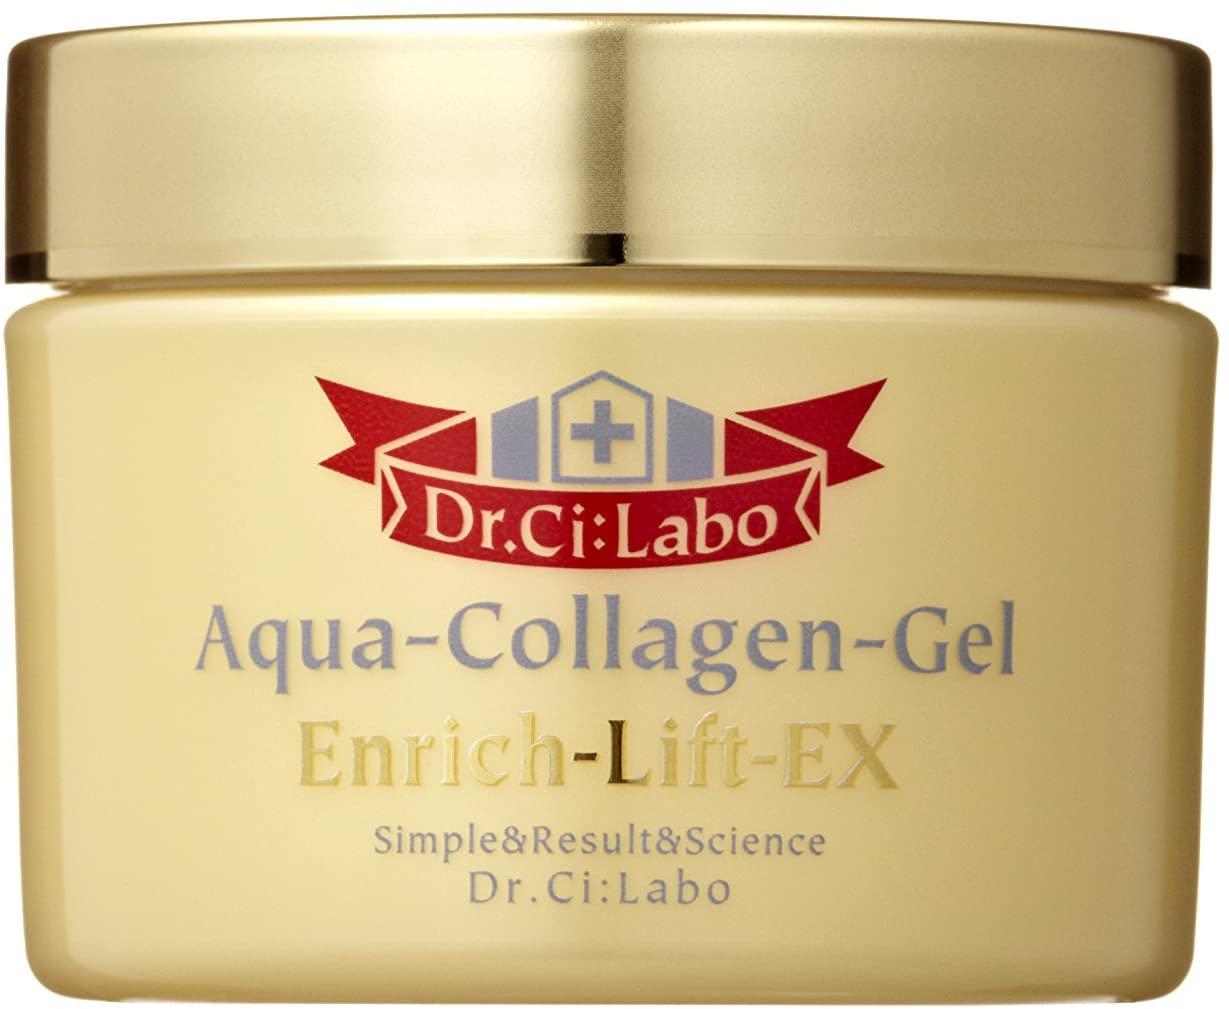 Dr.Ci:Labo(ドクターシーラボ) アクアコラーゲンゲル エンリッチリフトEX